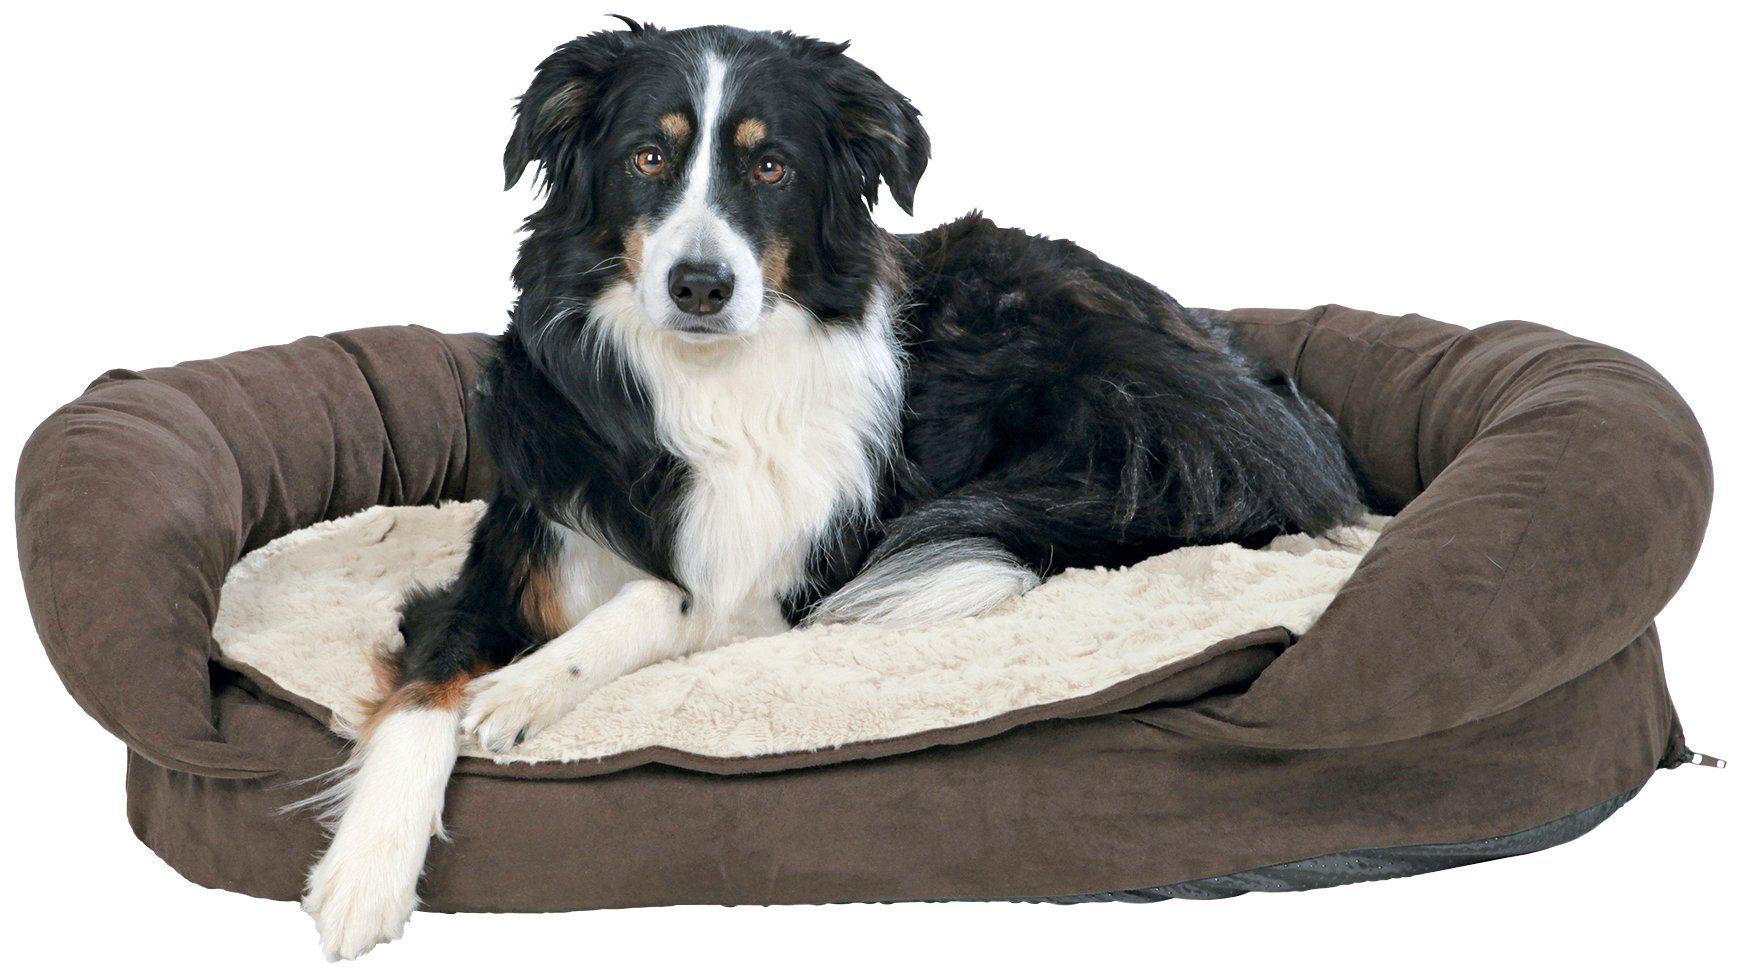 Hunde-Bett »Vital Bett Fabiano«, BxL: 95x67 cm, braun/beige